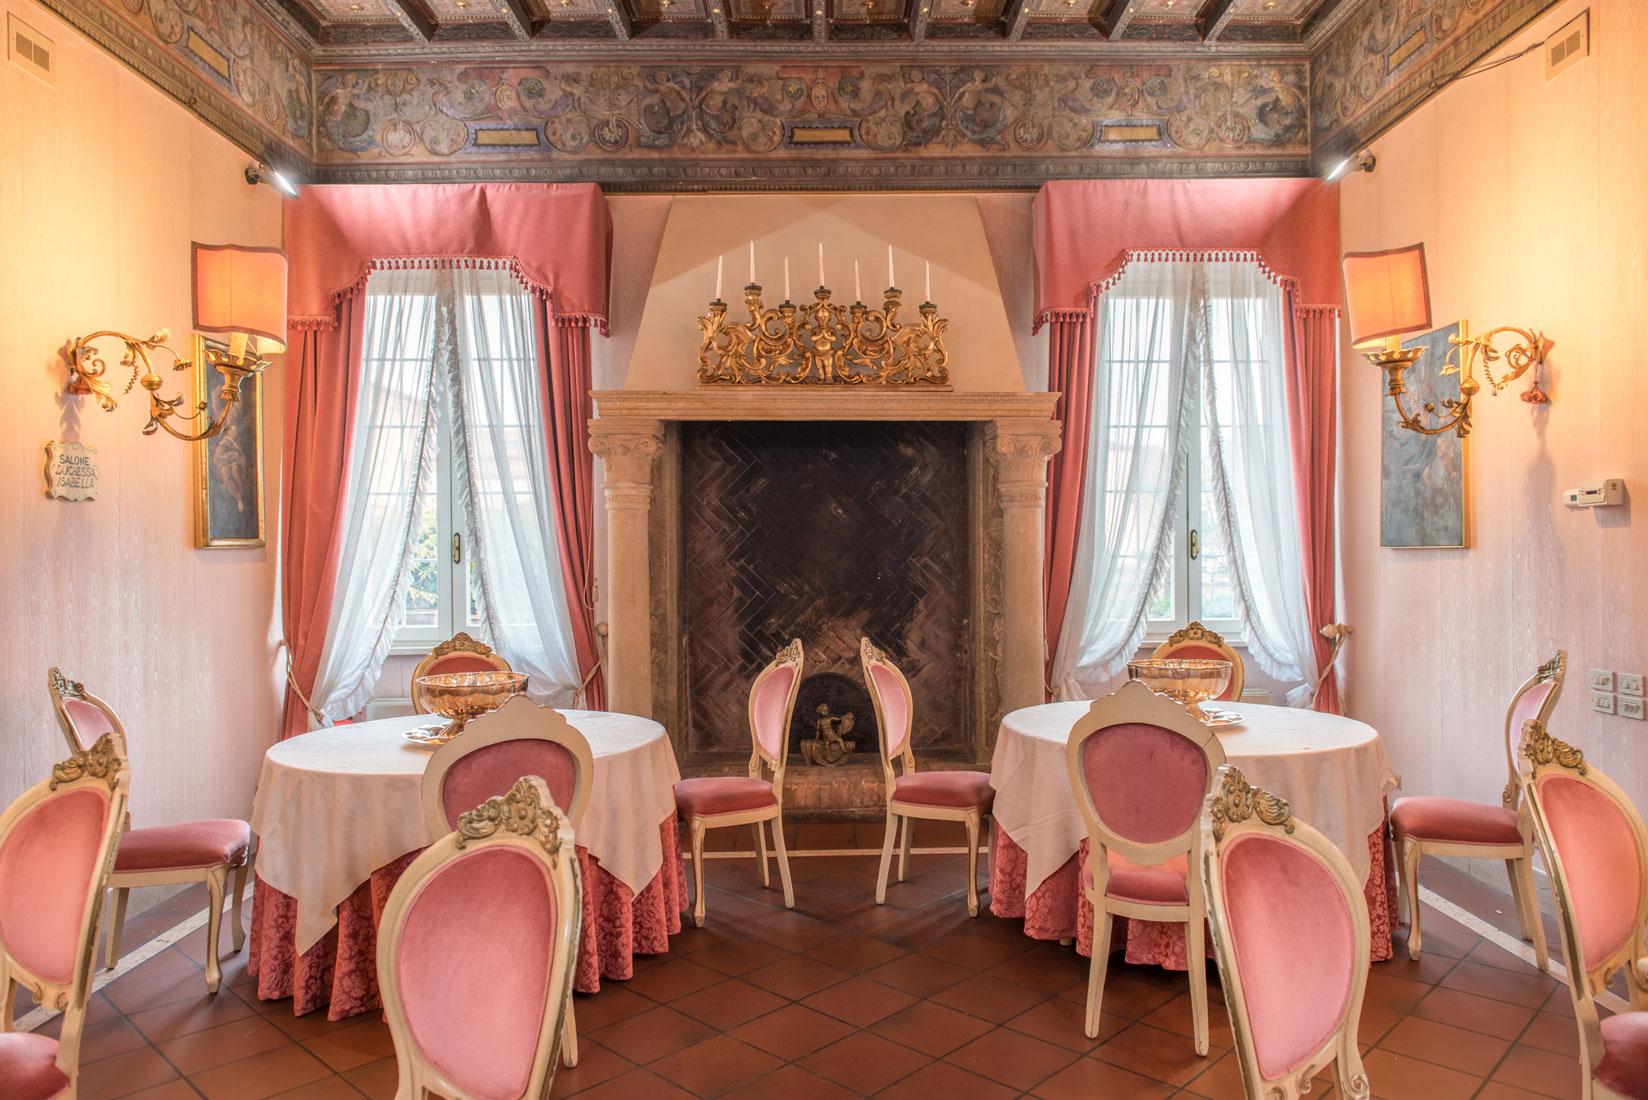 https://www.orlandinifrancesco.com/wp/wp-content/uploads/2019/01/Duchessa-Isabella-Ferrara-Posti-Comuni-8.jpg